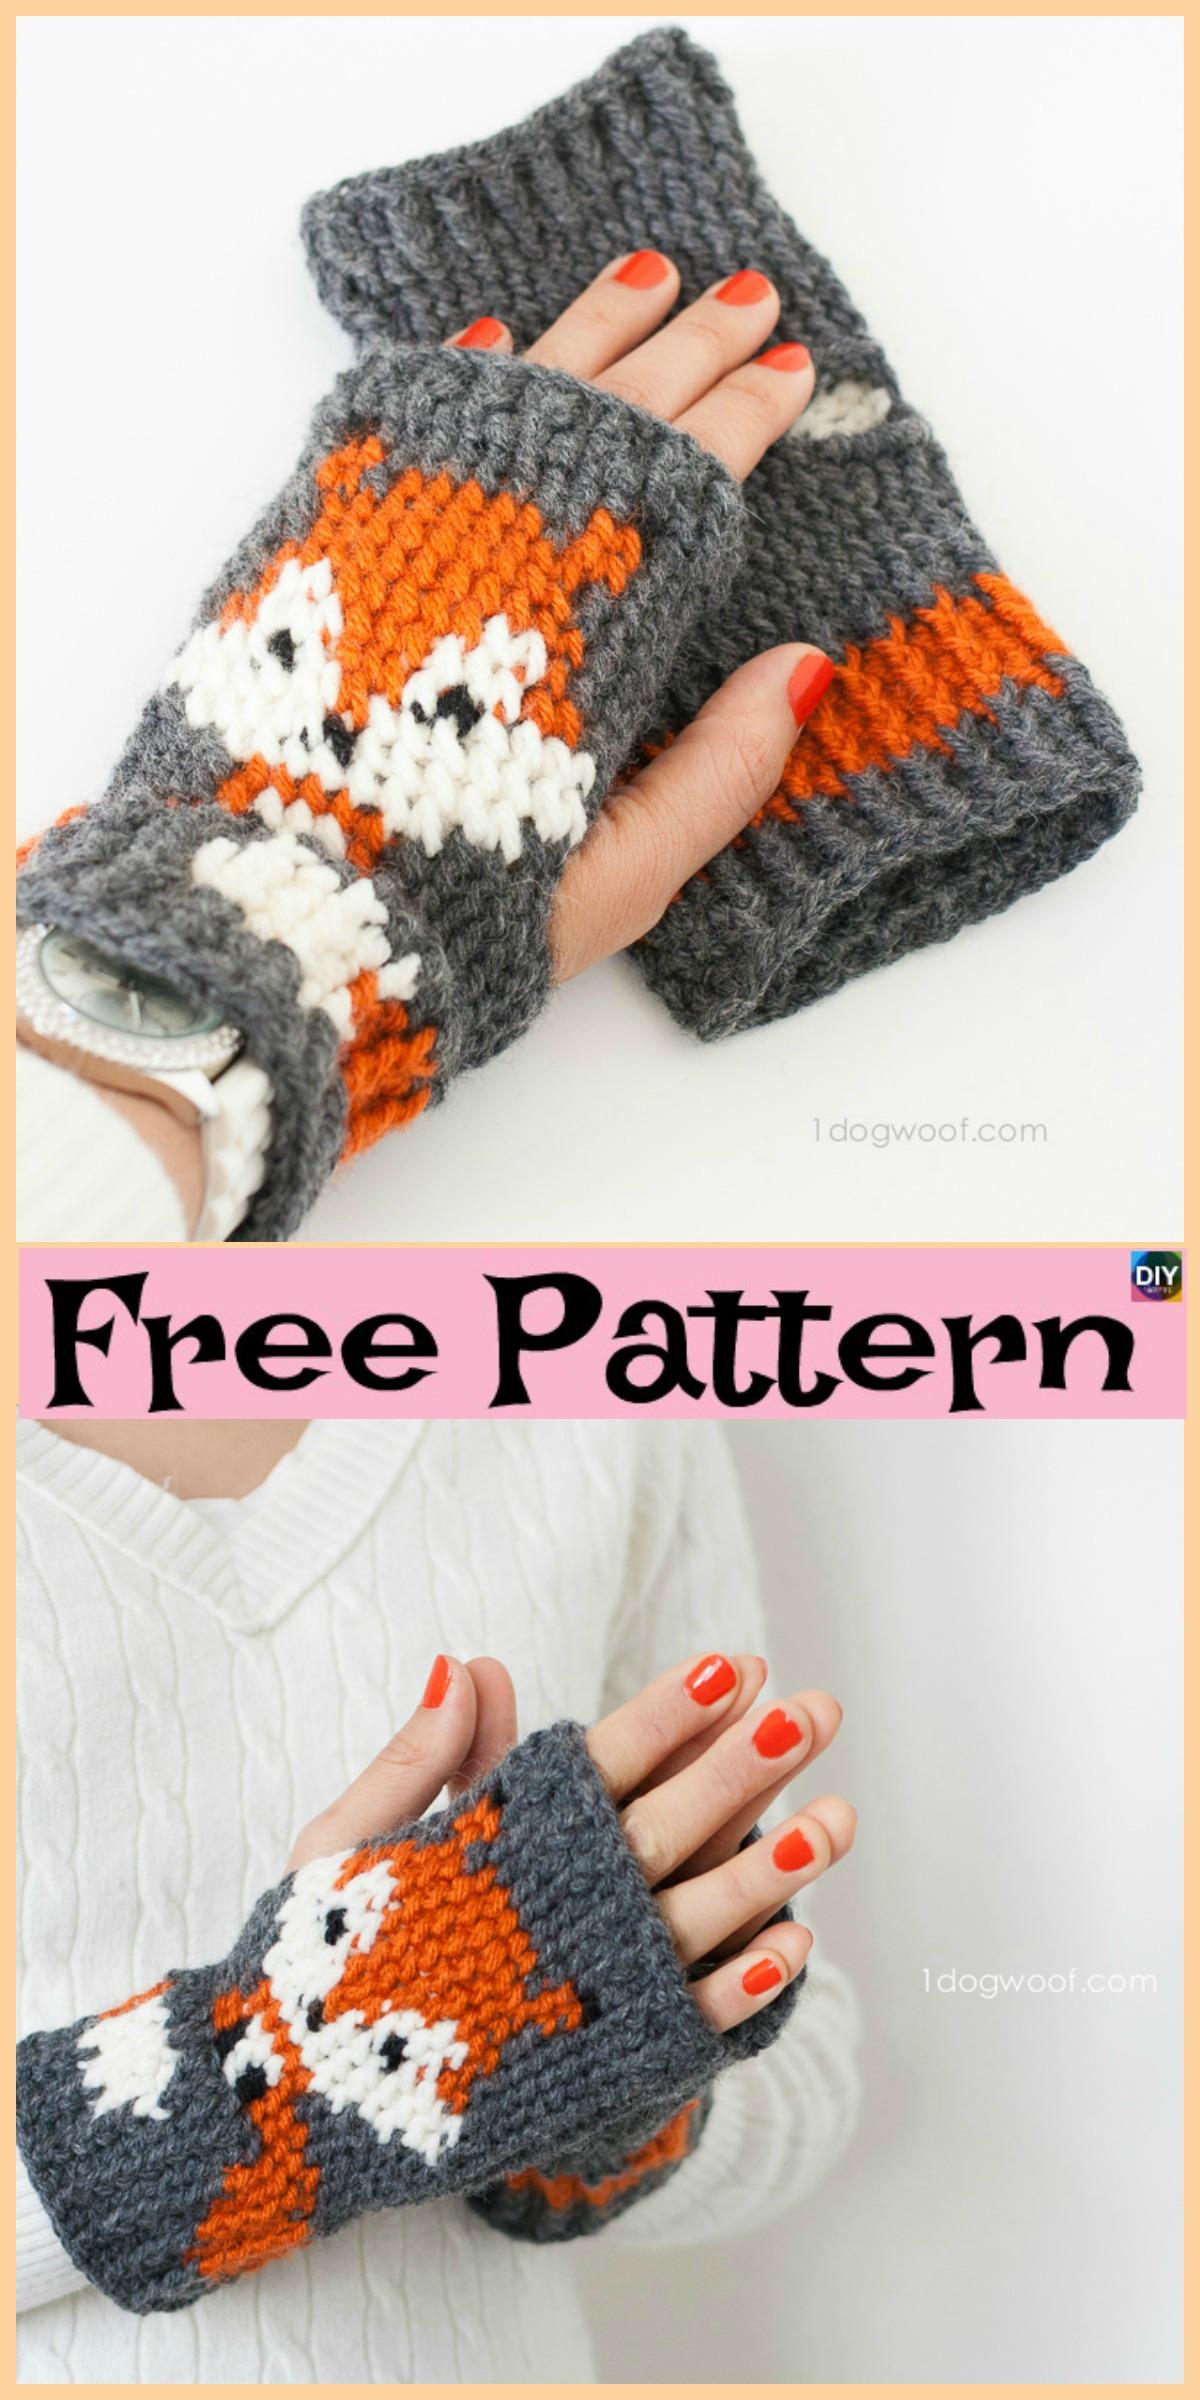 diy4ever-Knit Crochet Fox Mittens - Free Patterns